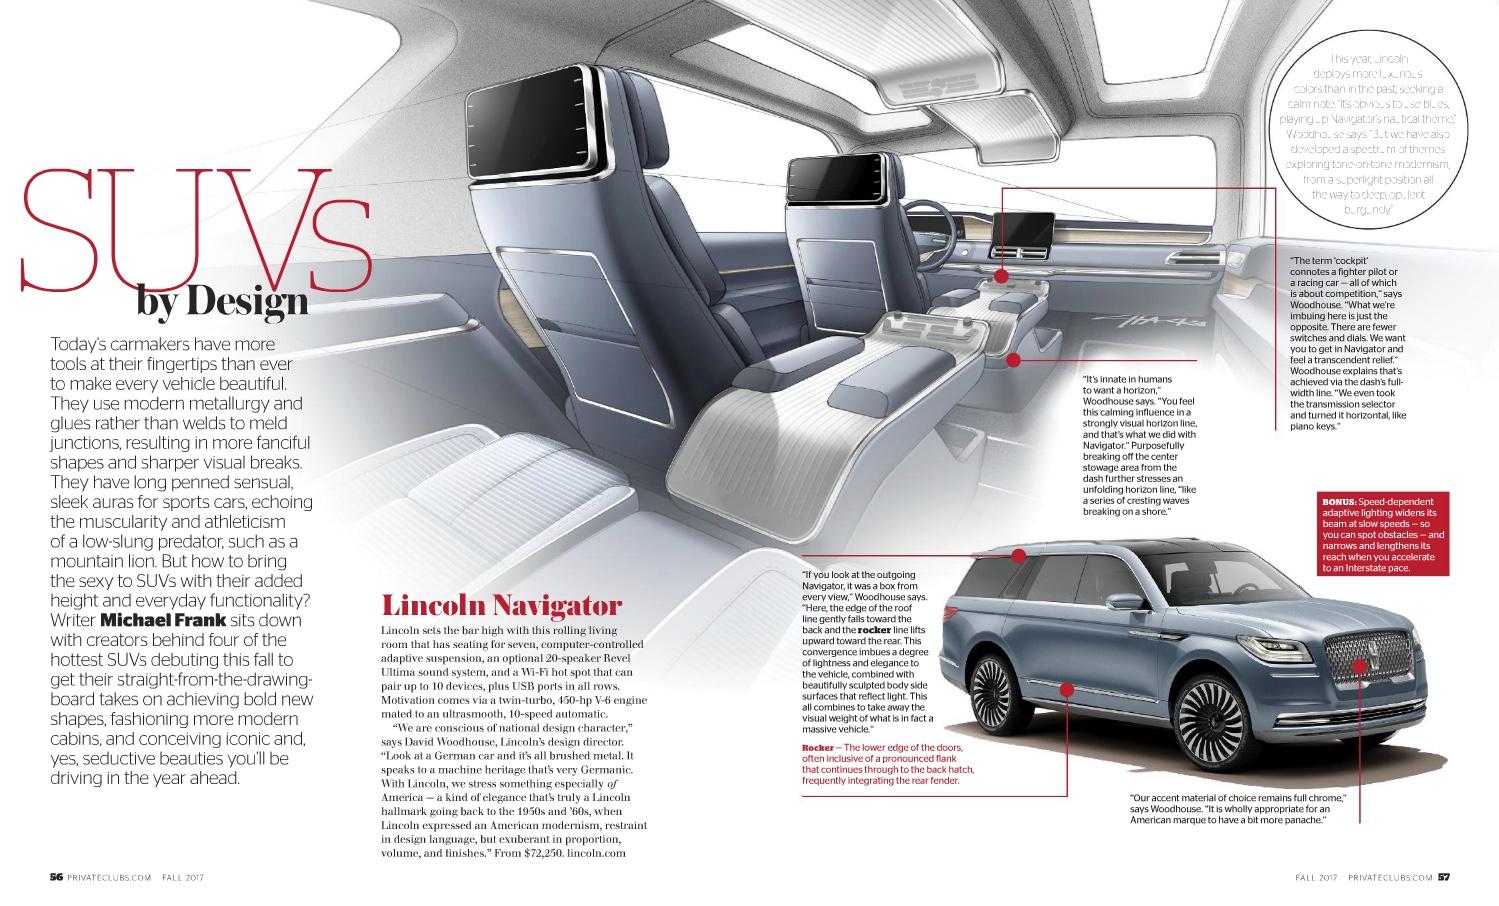 Private Clubs: Designing Beautiful SUVs